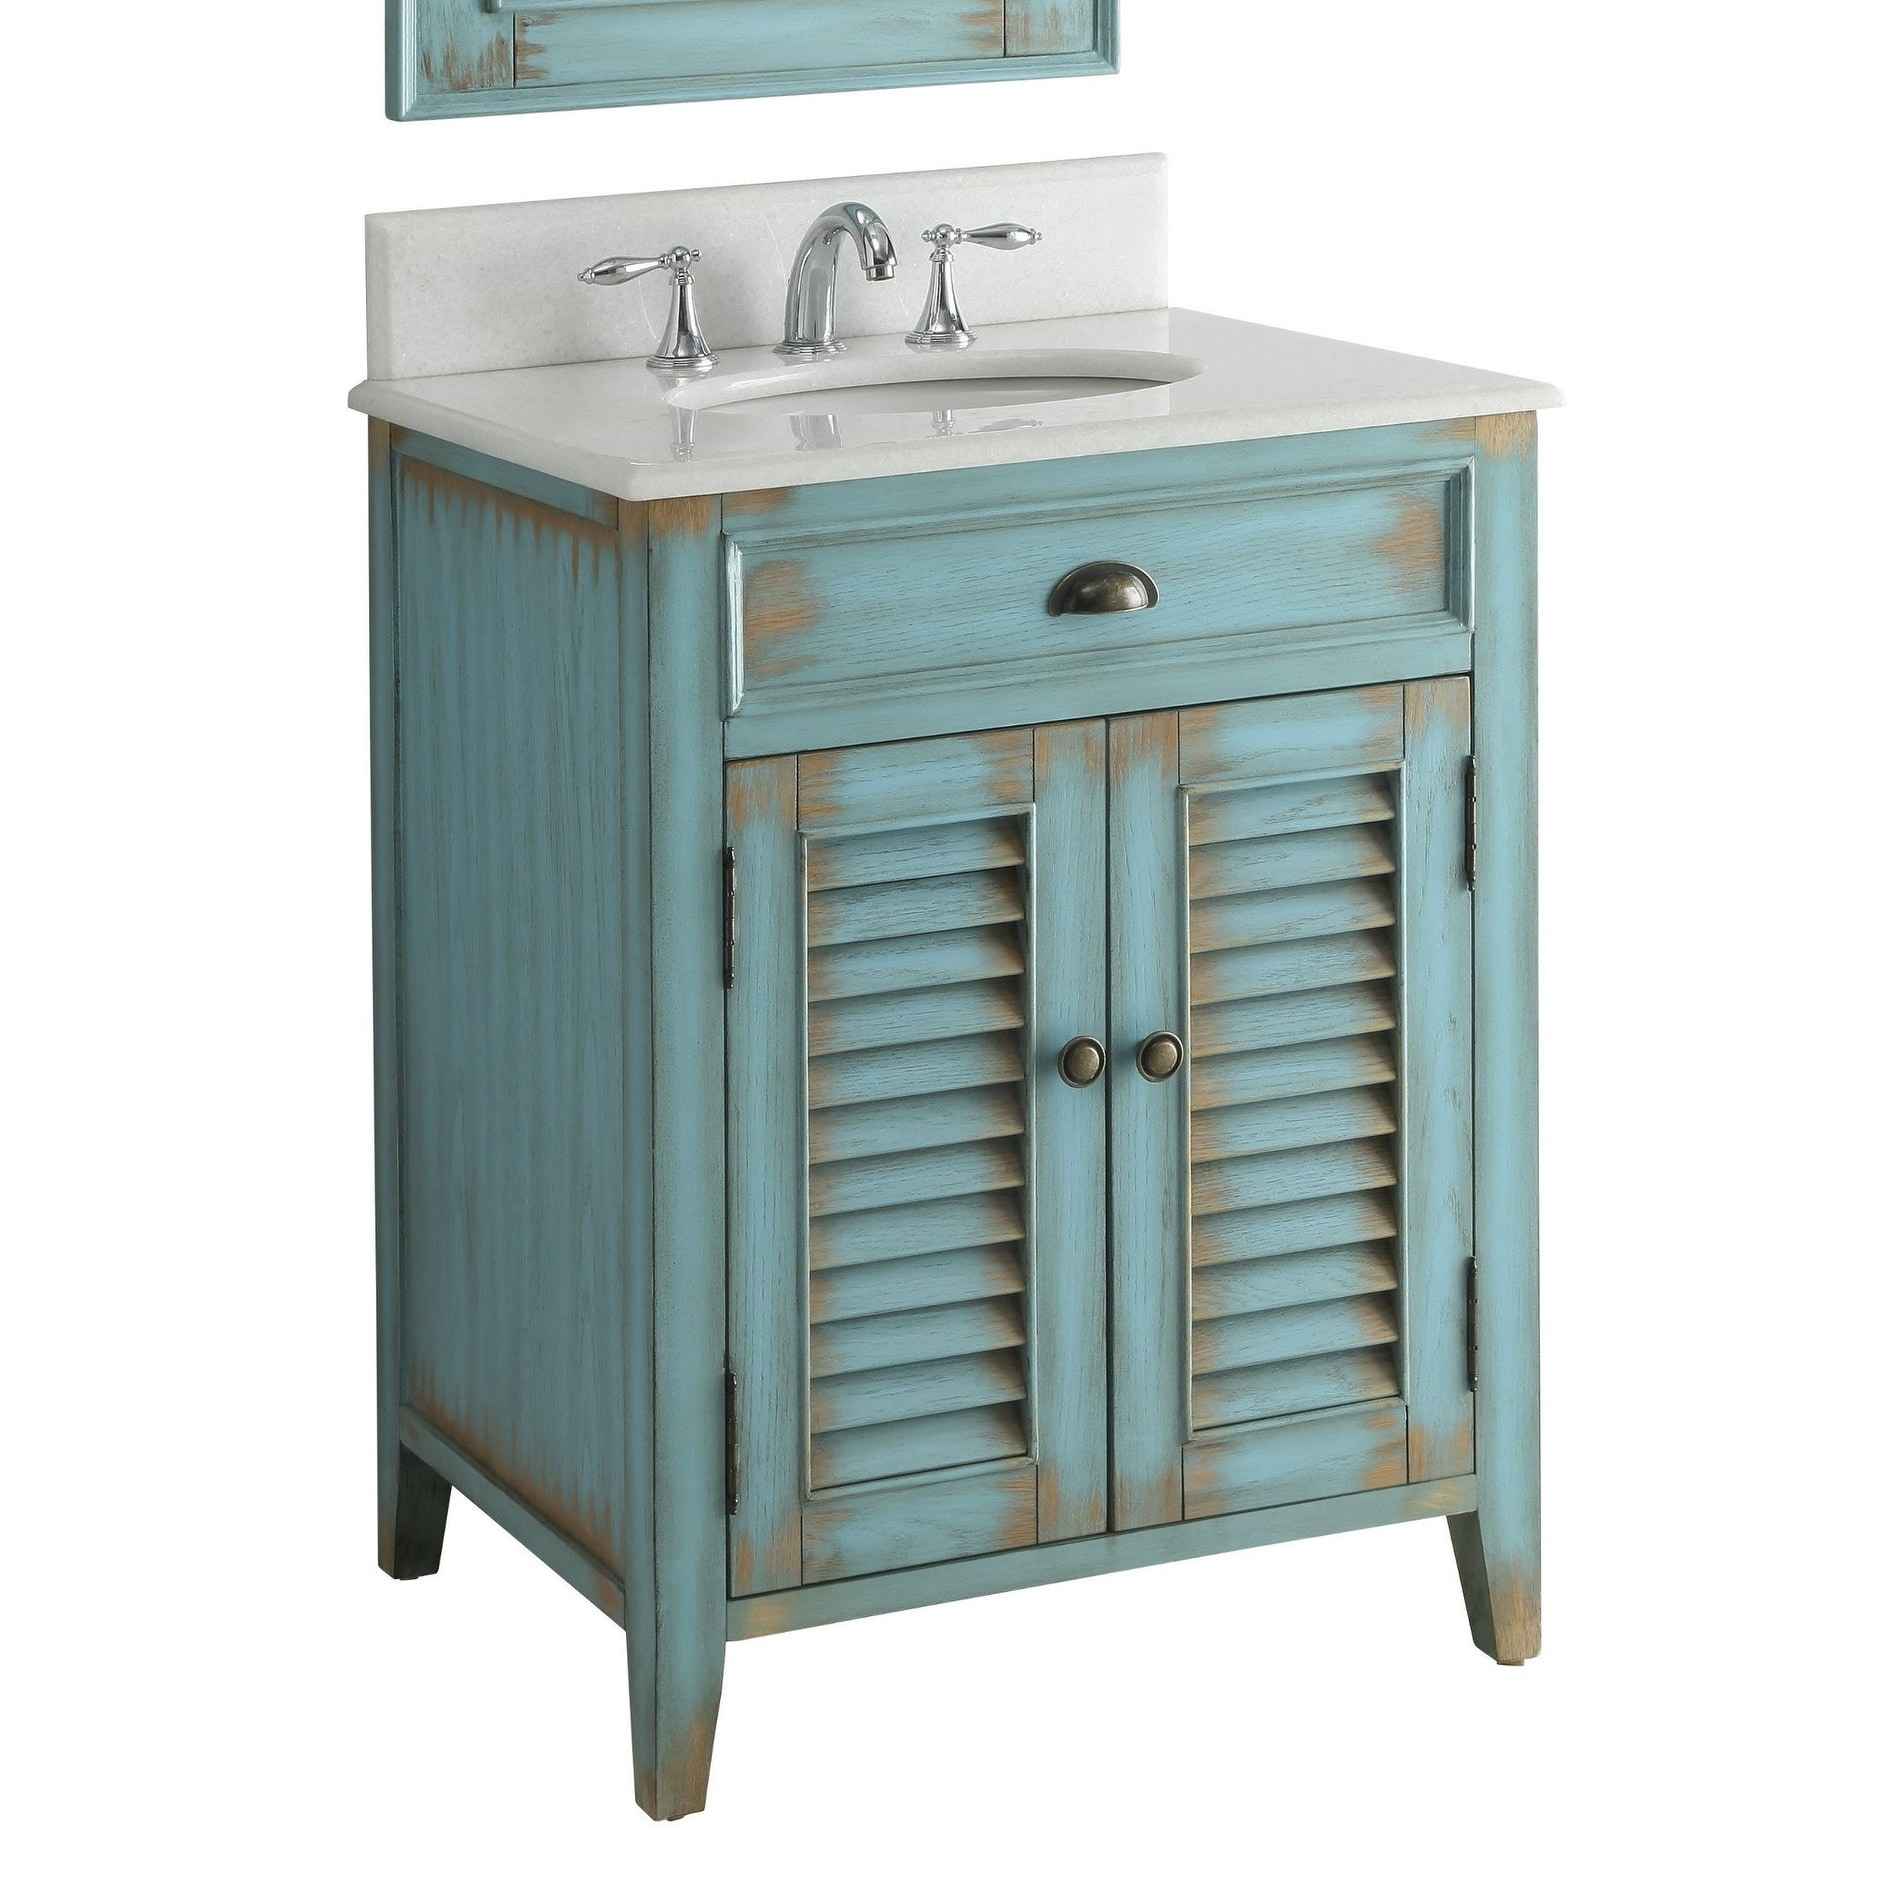 26 Benton Collection Abbeville Rustic Blue Bathroom Vanity Overstock 22322671